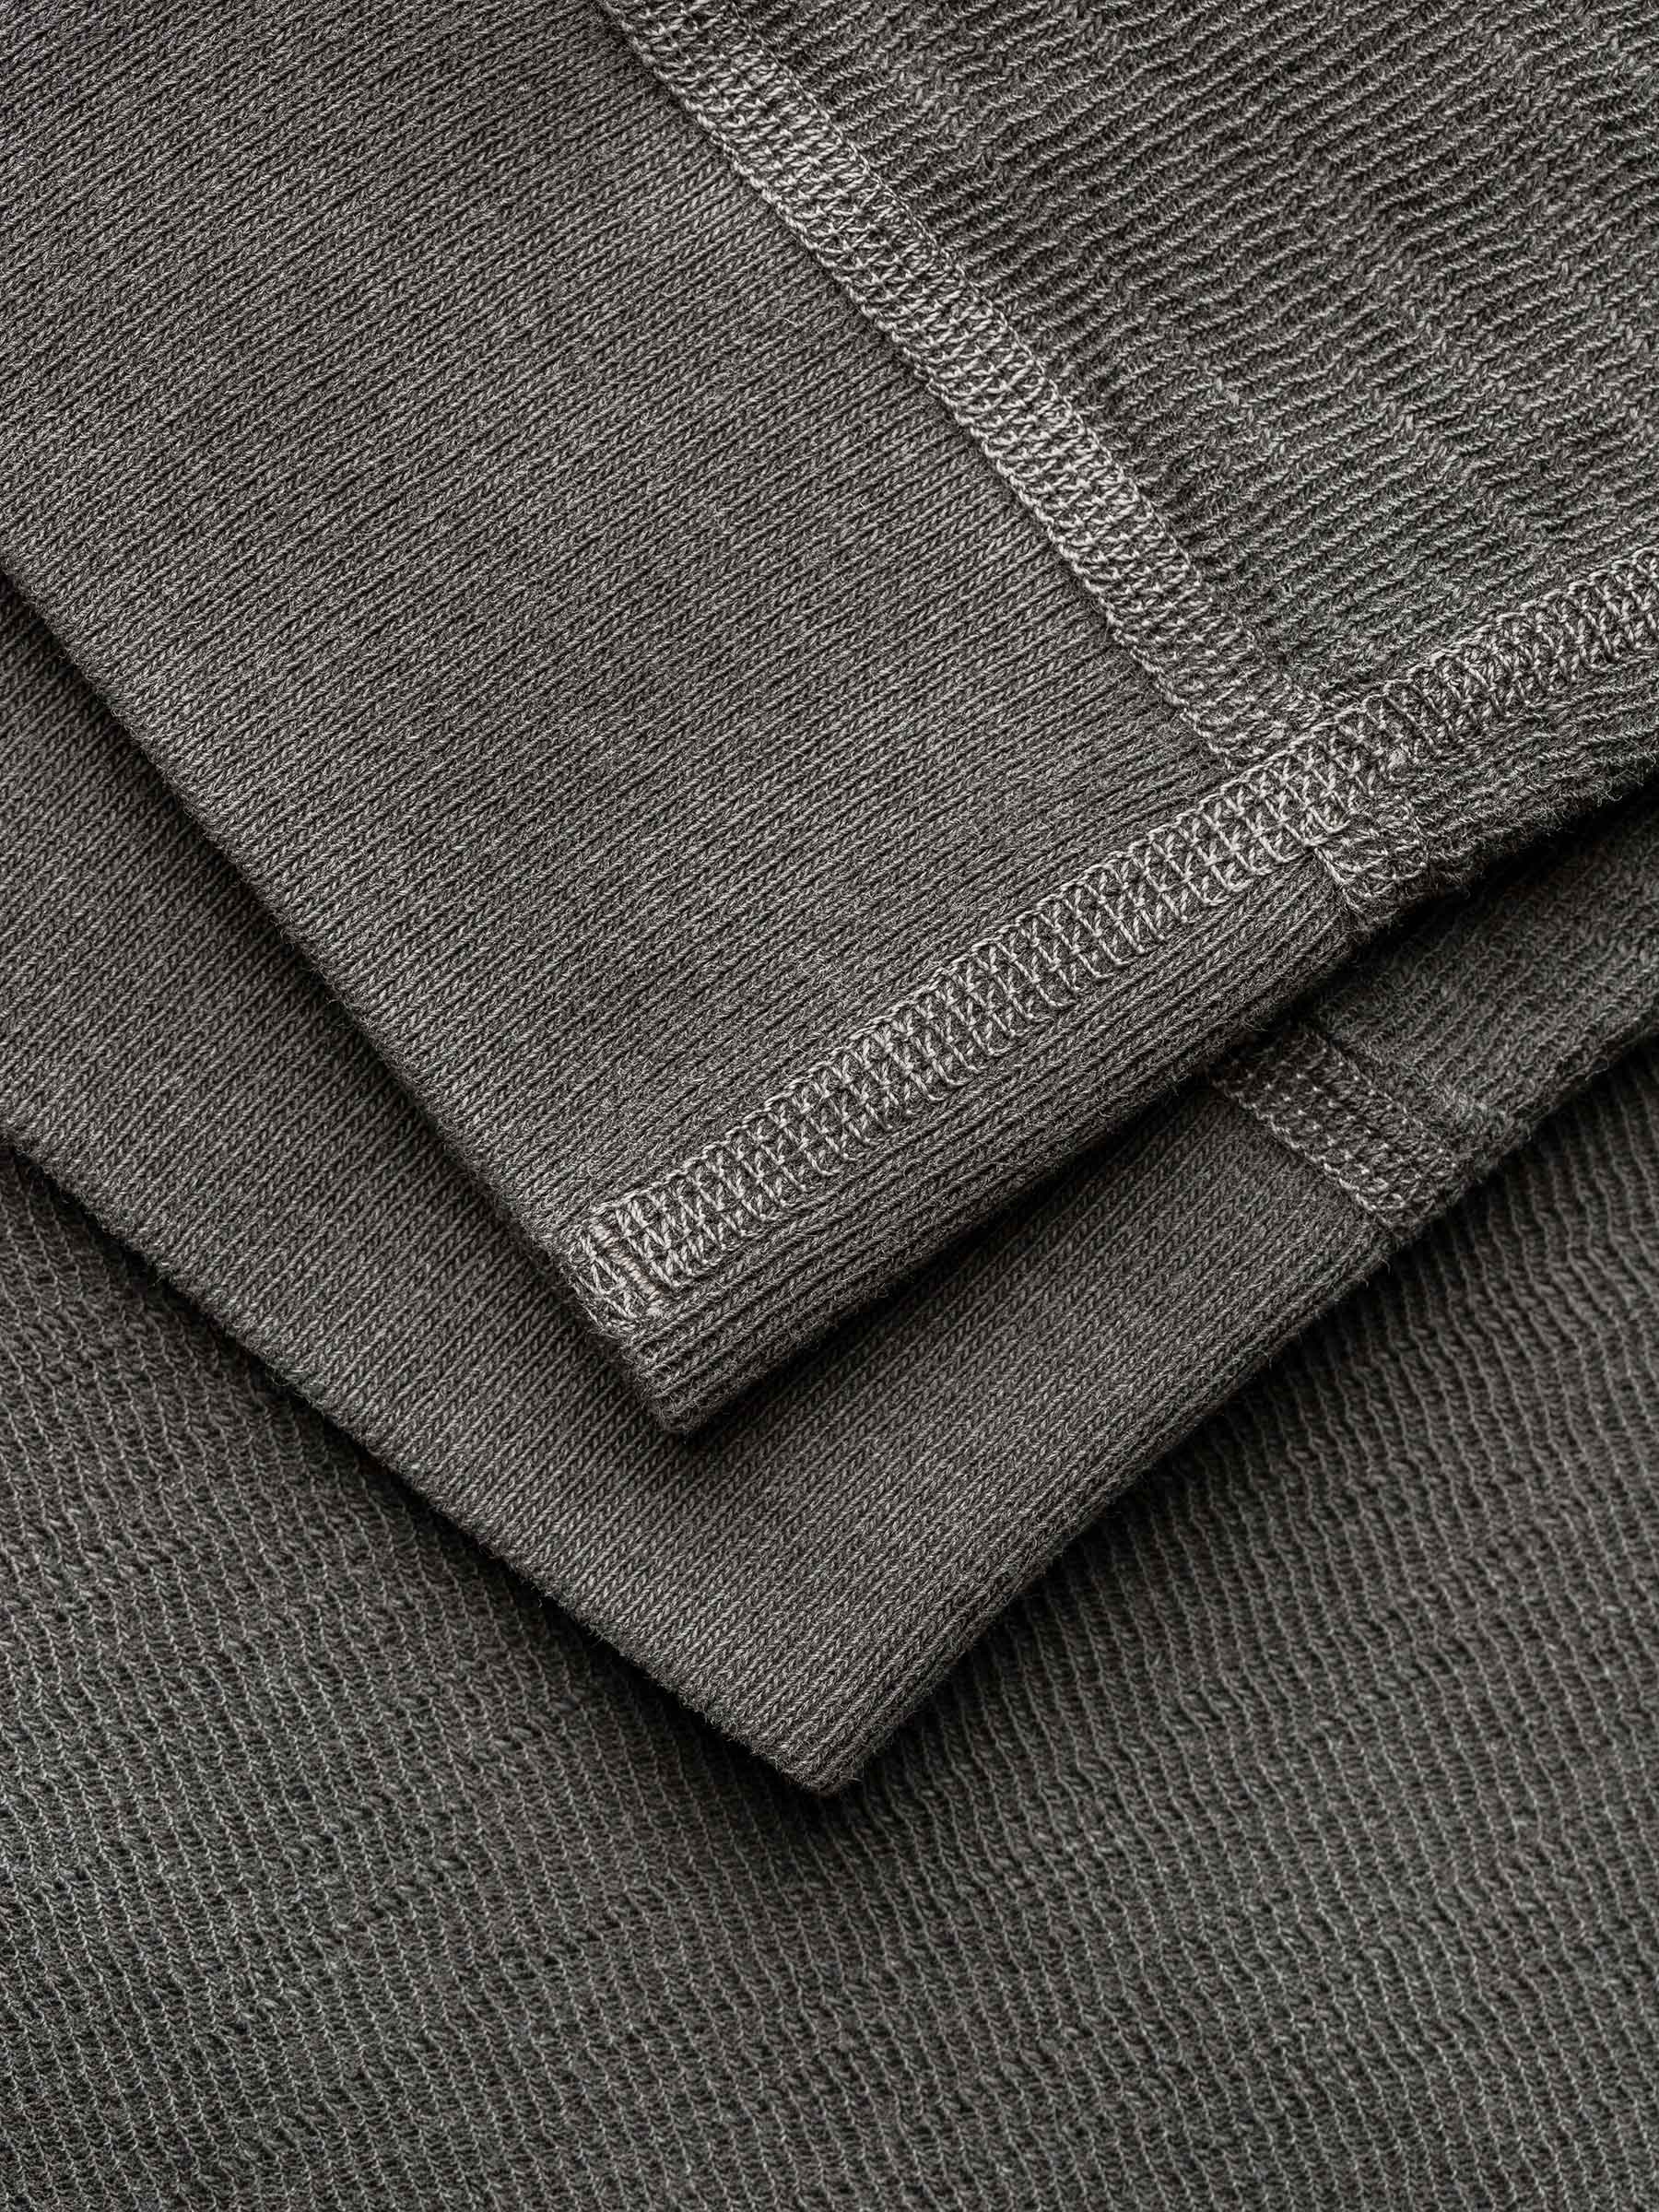 Buck Mason - Clove Venice Wash Lightweight Double Slub Sweatshirt